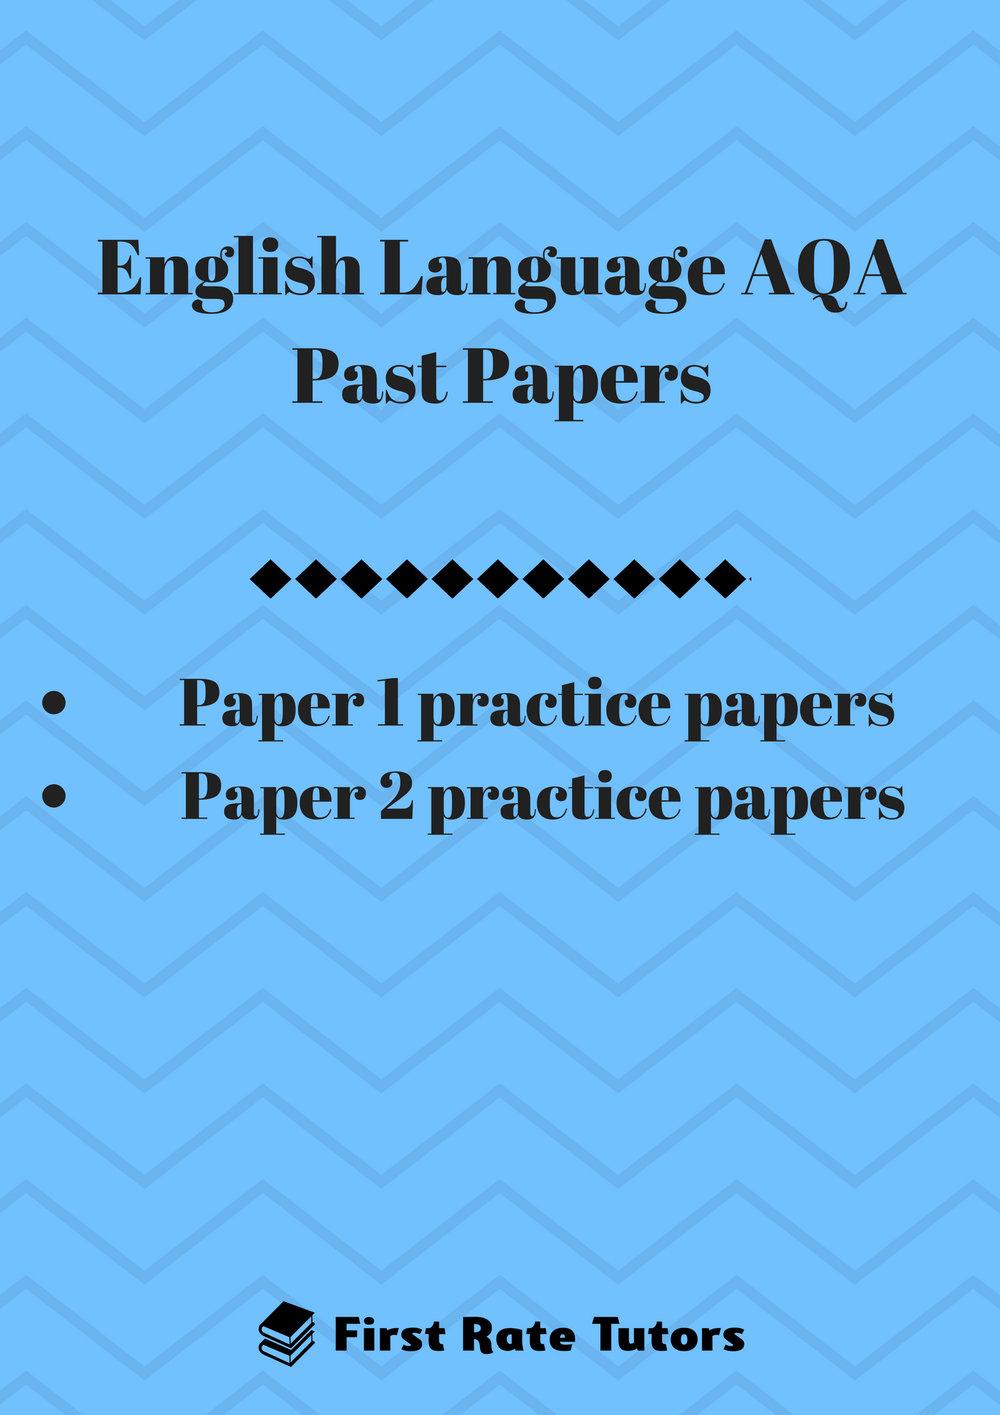 English+Language+AQAPast+Papers.jpg